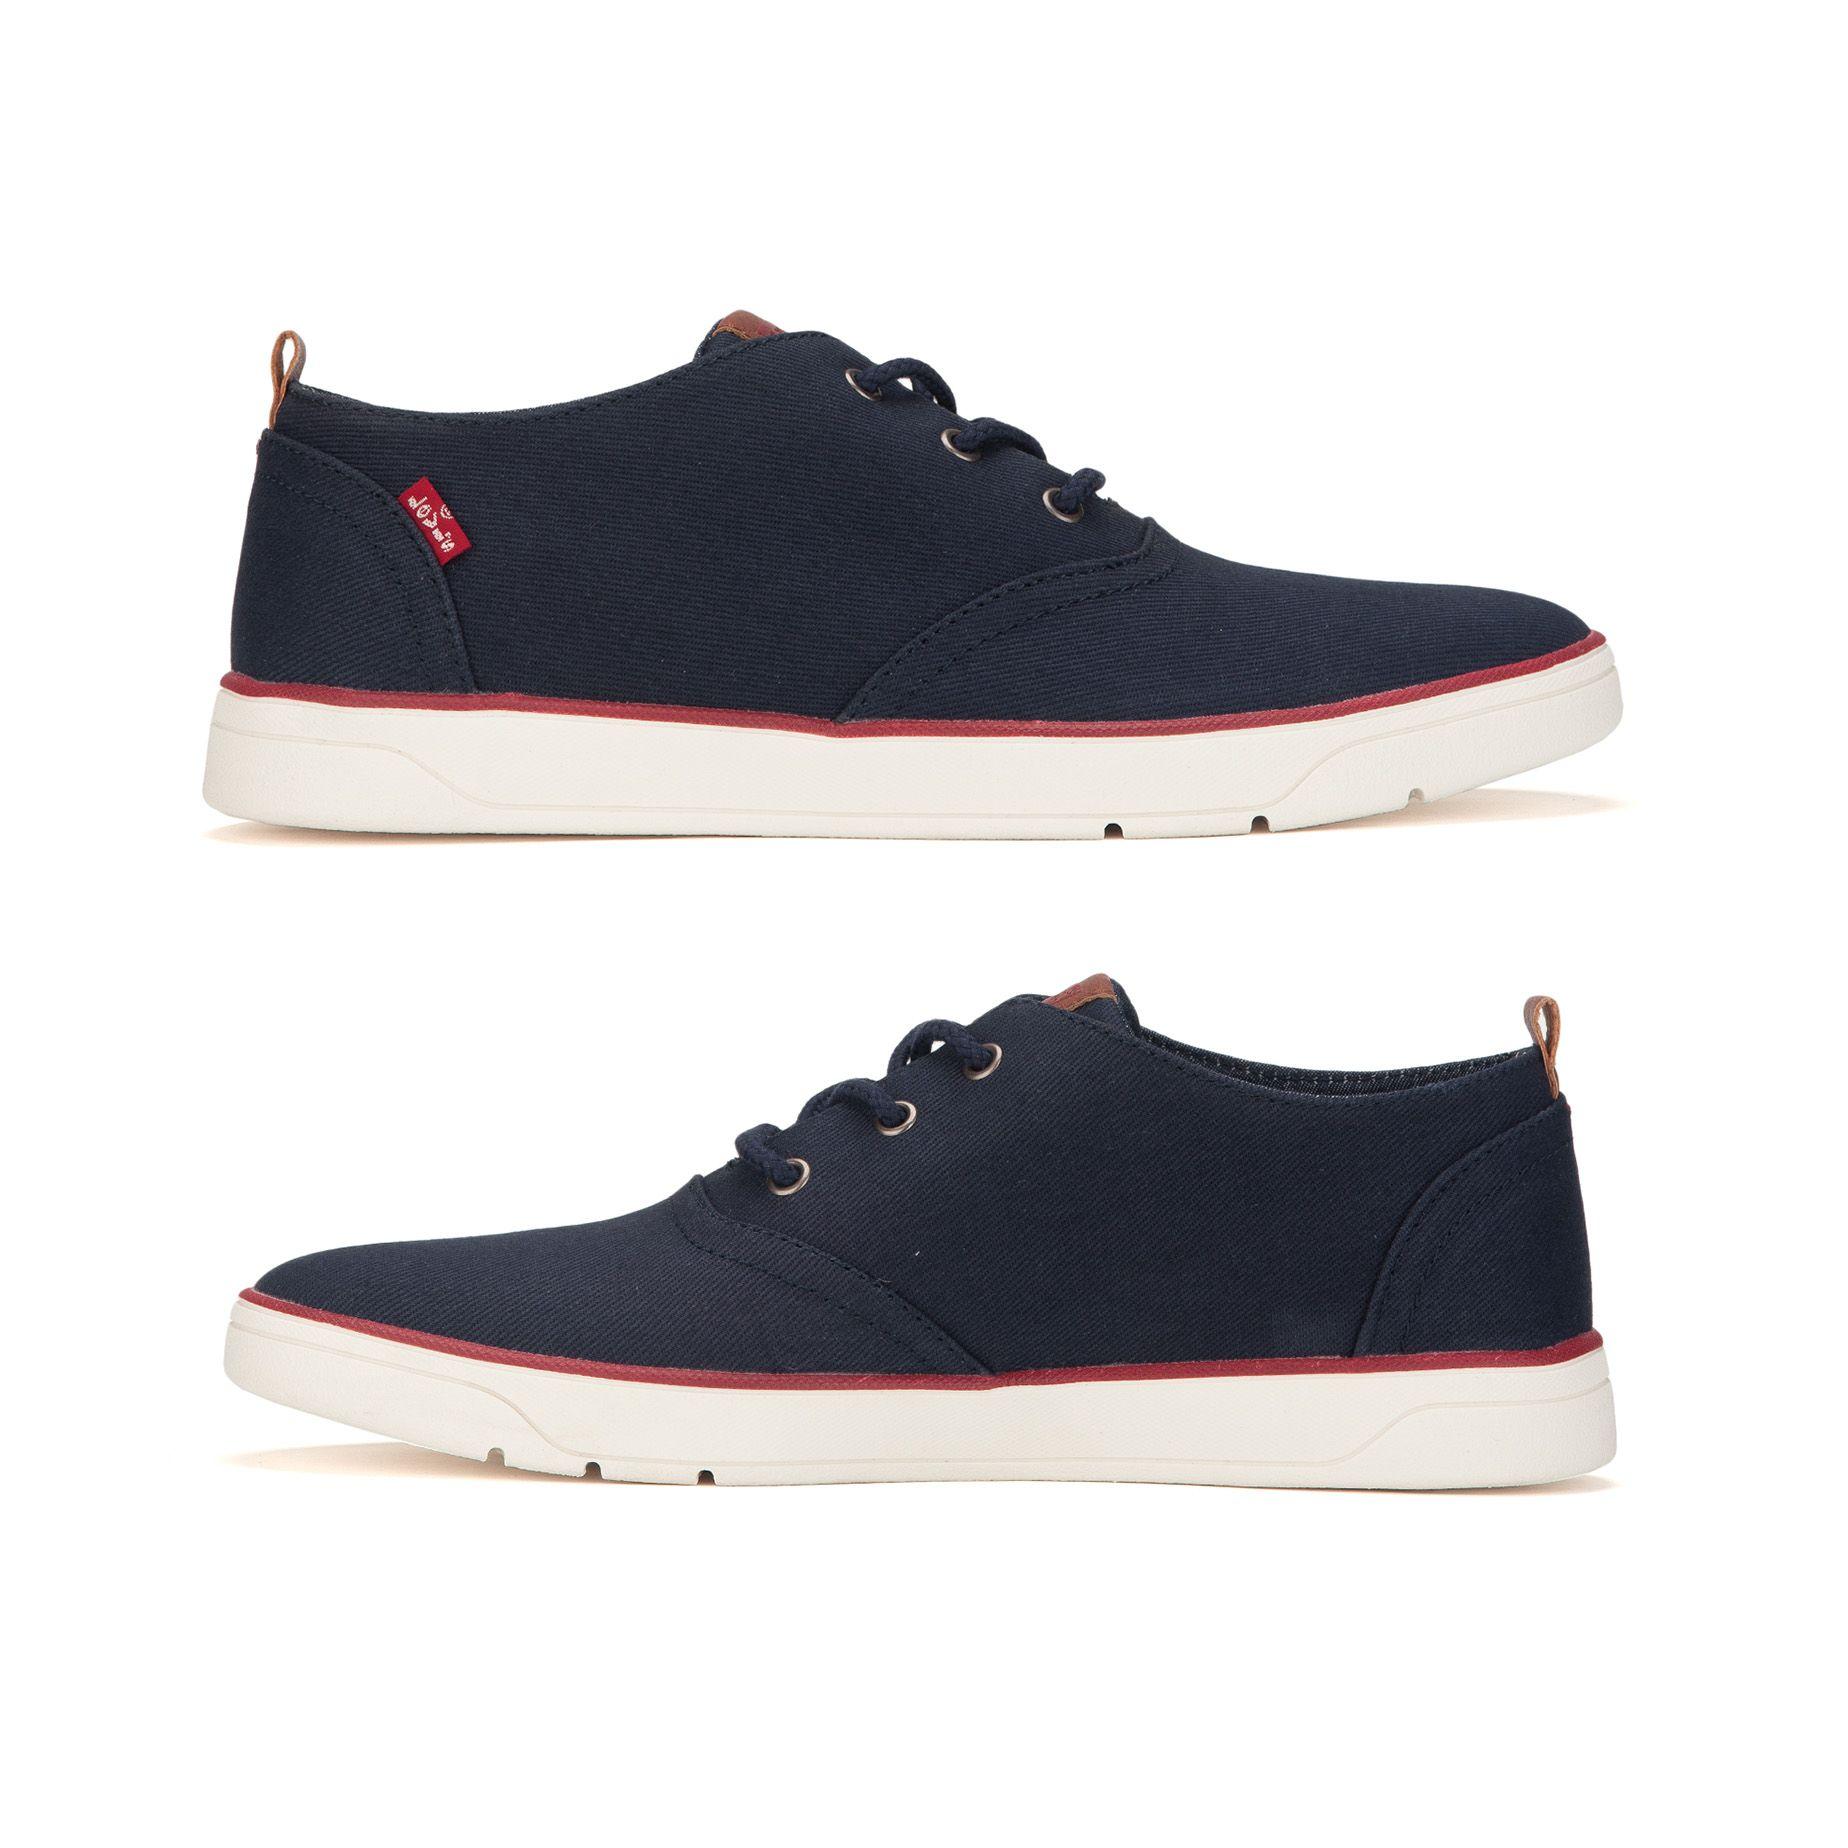 Butypl Buty Shoes Trampki Levis Wiosnalato2015 Wl15 Shoes Shoes 2015 Jeans Shop